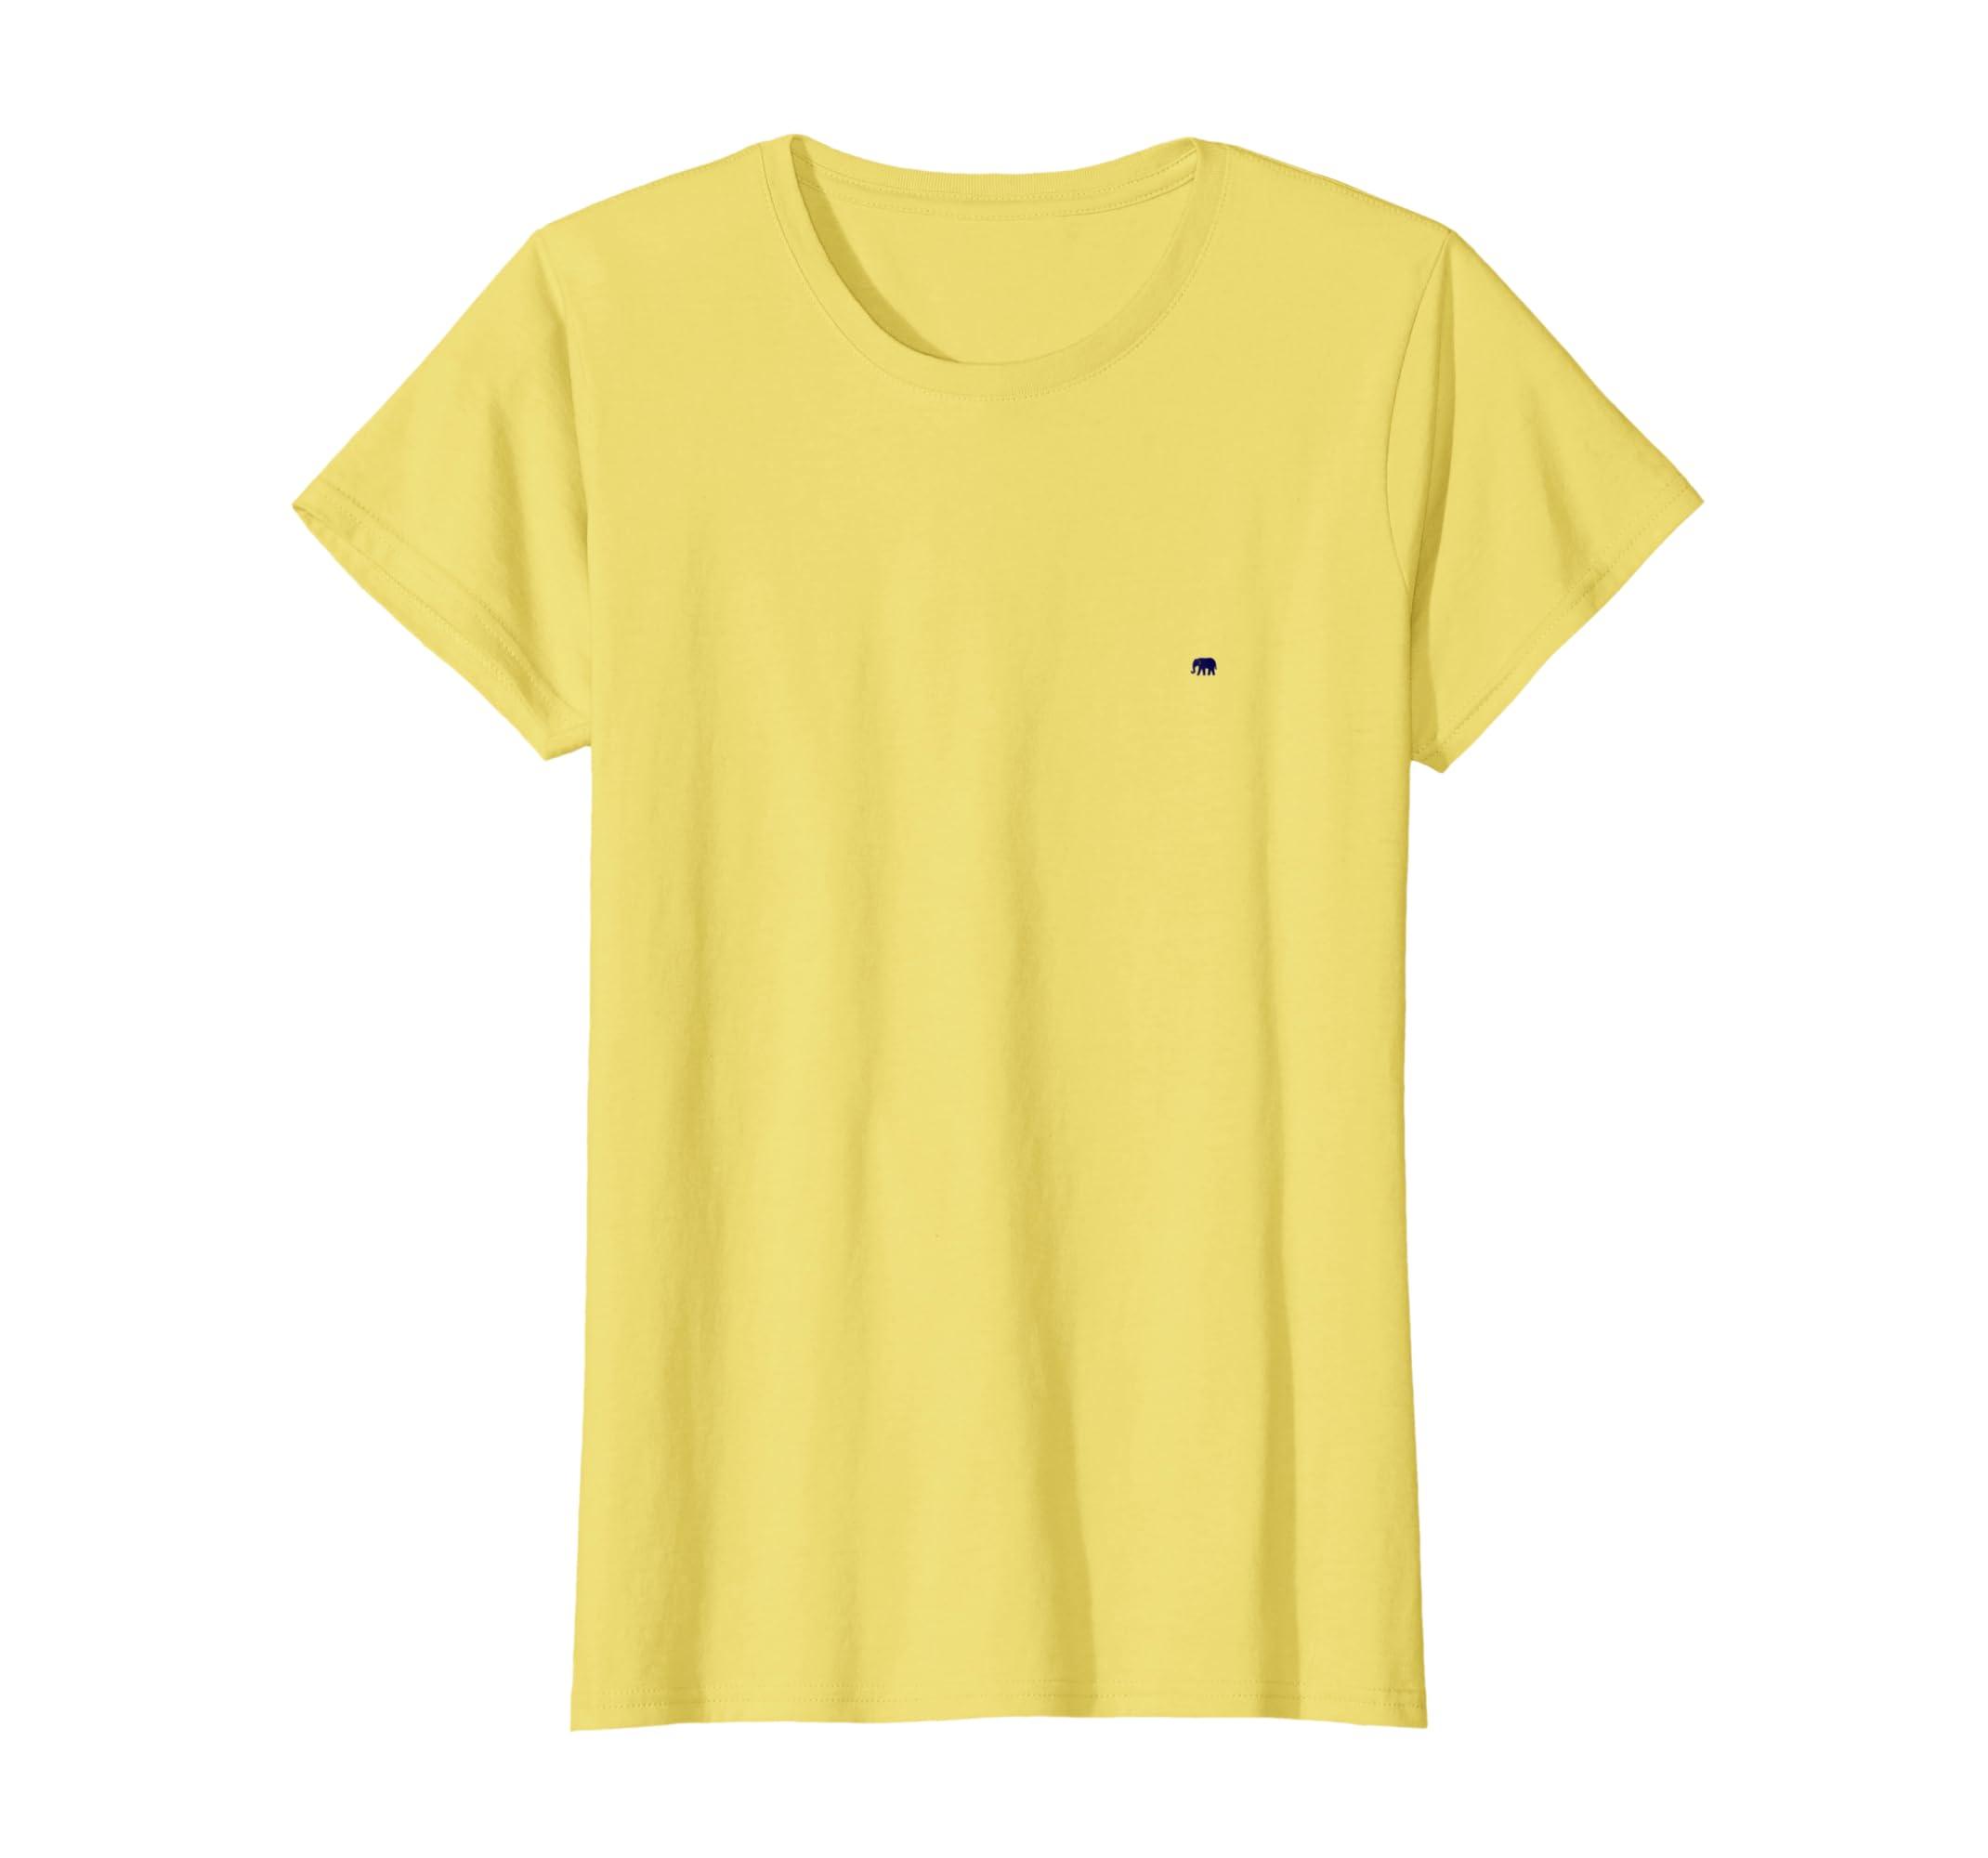 547ce7b9 Amazon.com: Plain Yellow Shirts For Boys: Yellow T Shirt Graphic Logo:  Clothing